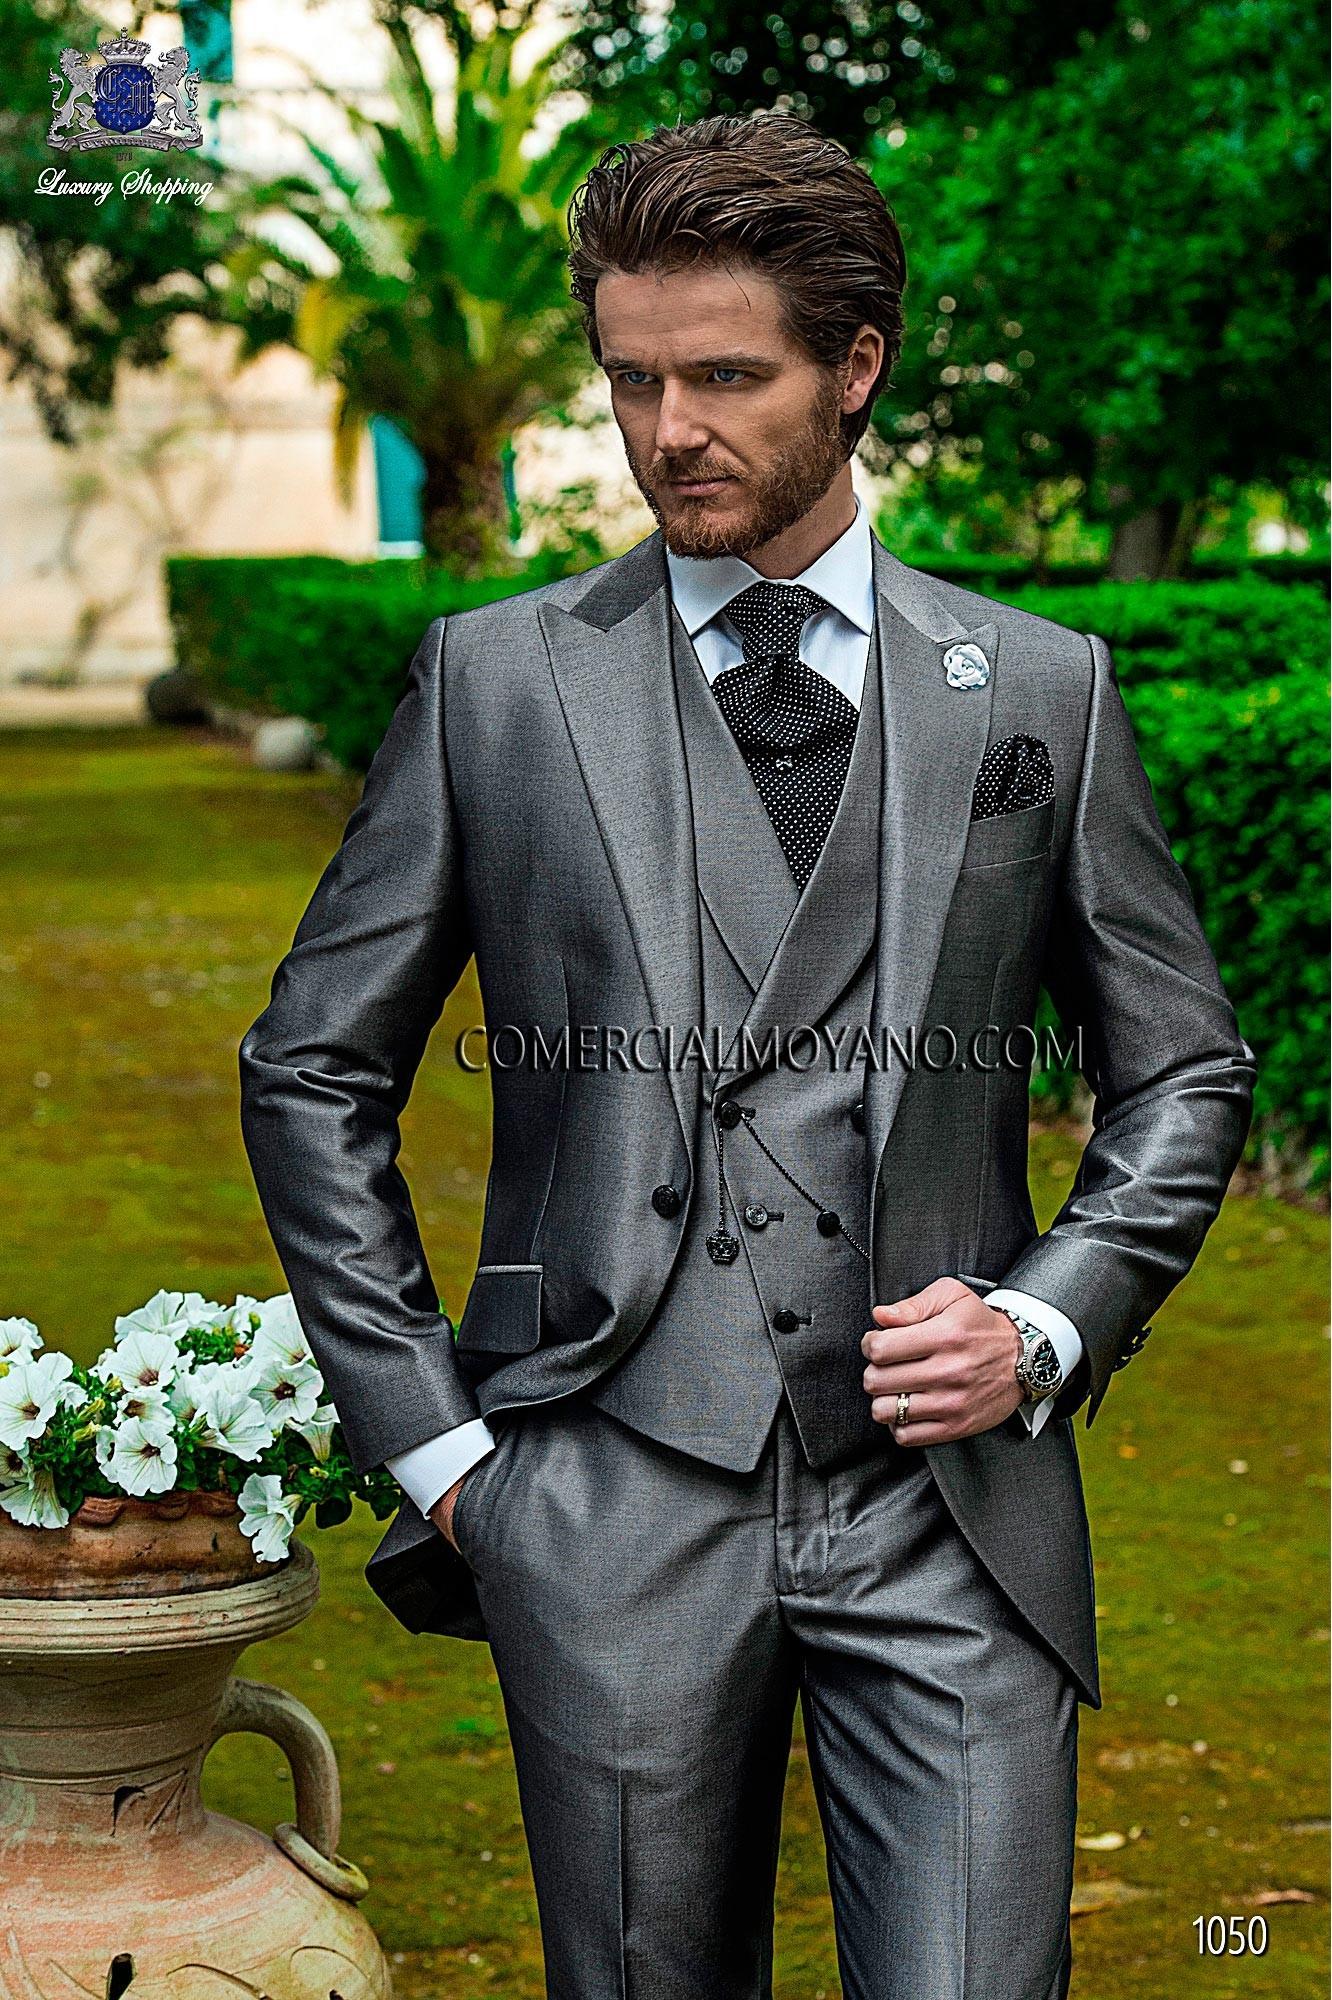 Traje de novio moderno gris modelo: 1050 Ottavio Nuccio Gala colección Fashion